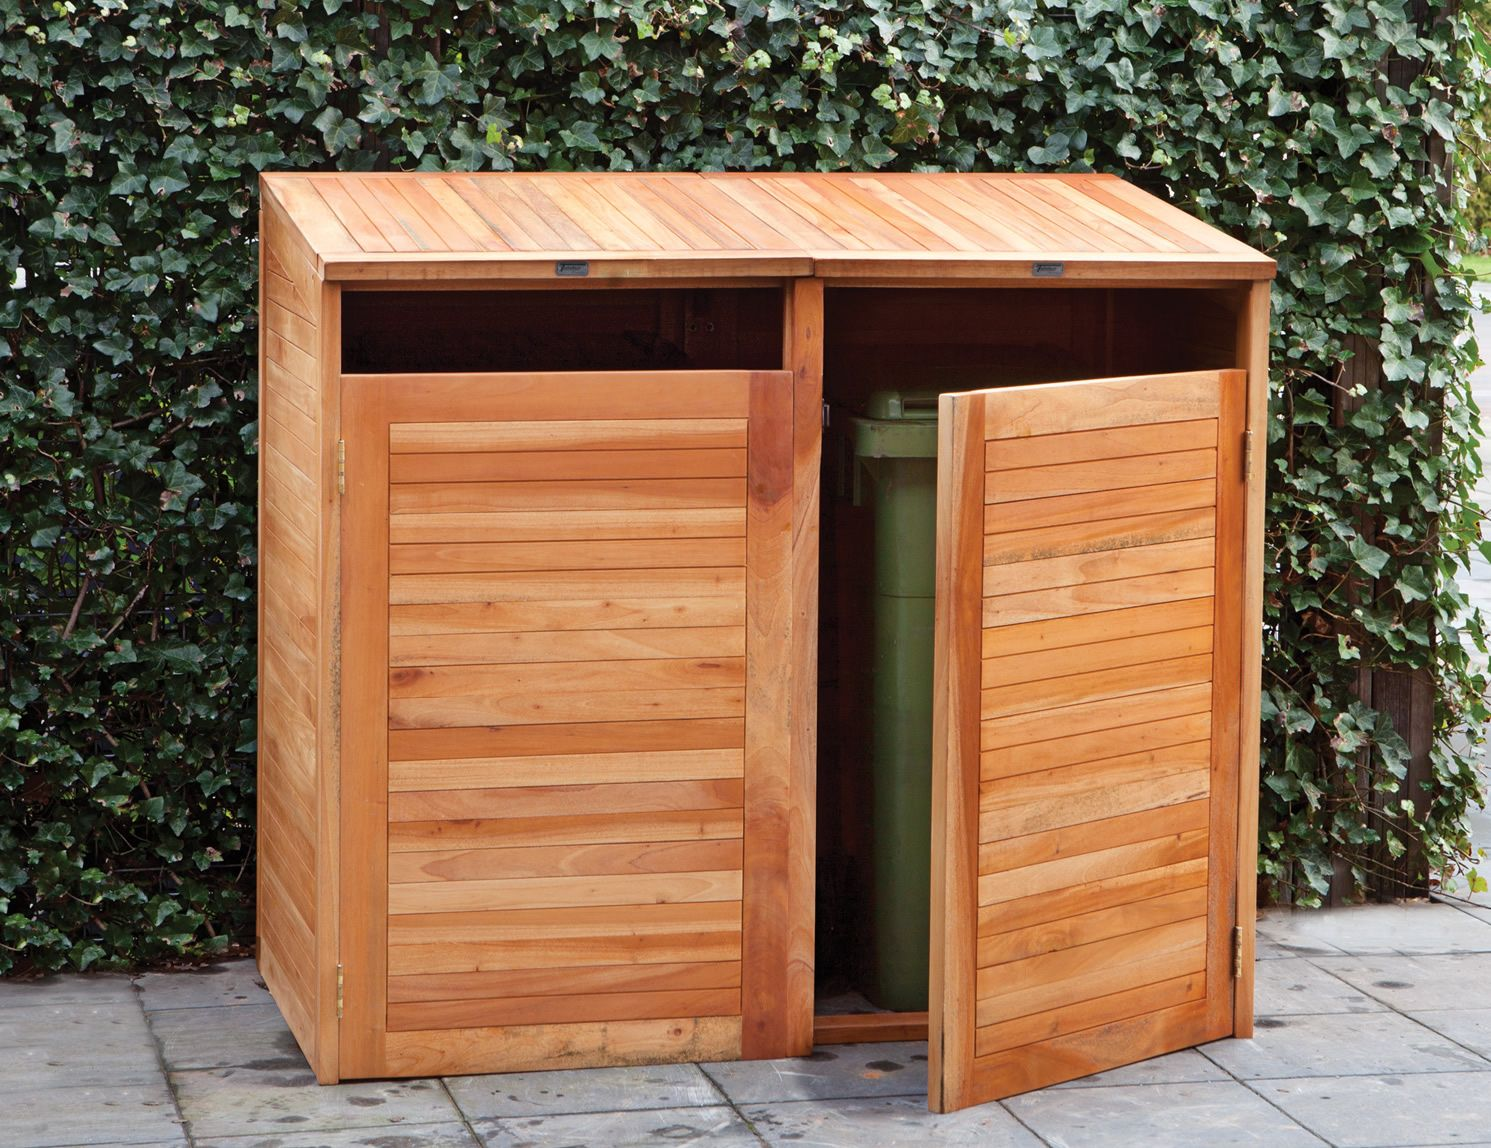 Hardwood Double Wheelie Bin Store Garden Ideas